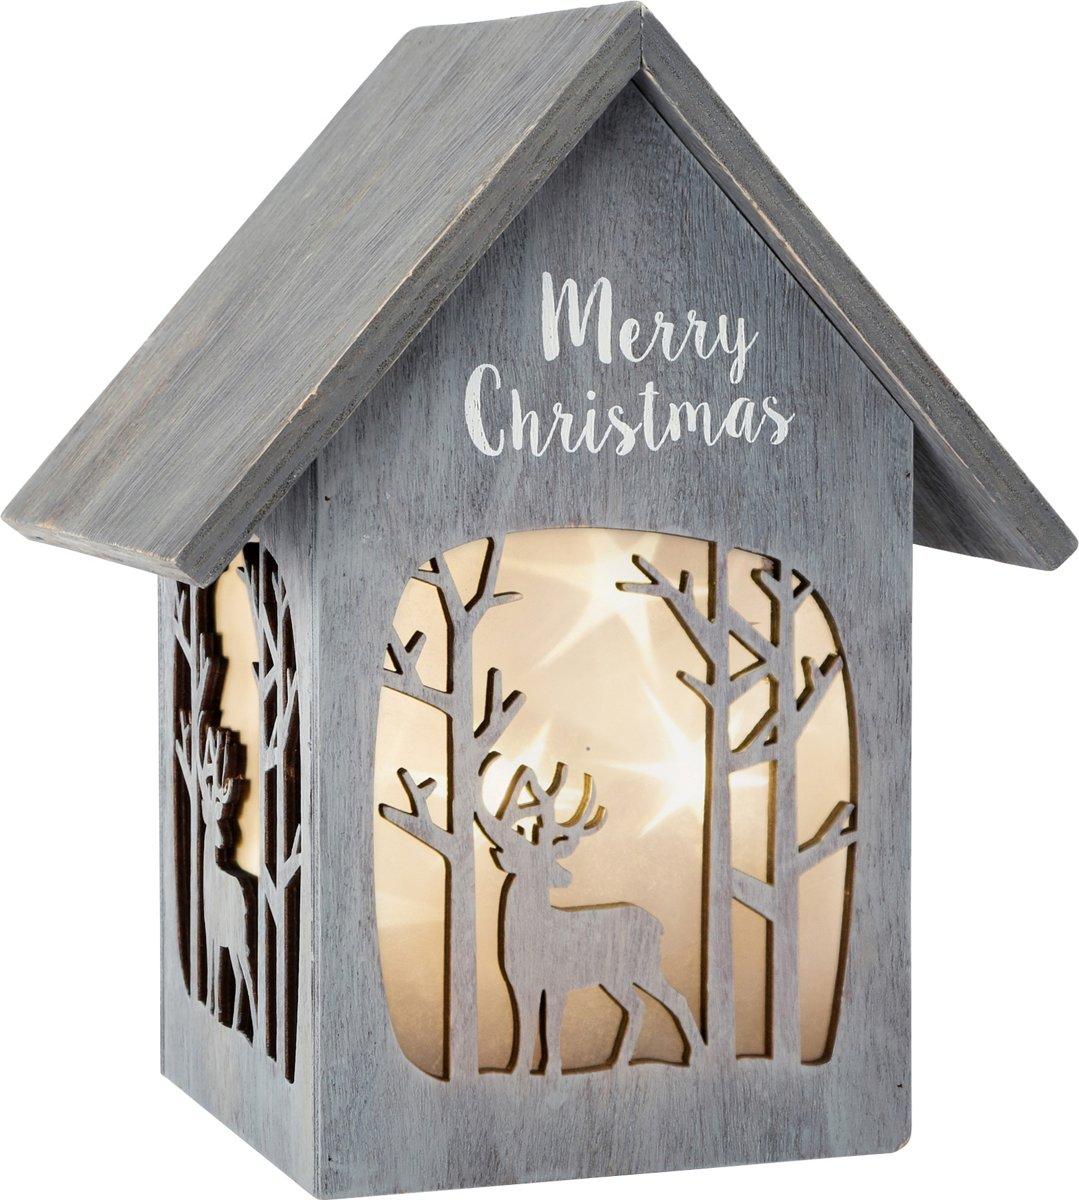 Small Foot Verlicht kersthuisje 21 x 16 x 25 cm hout grijs